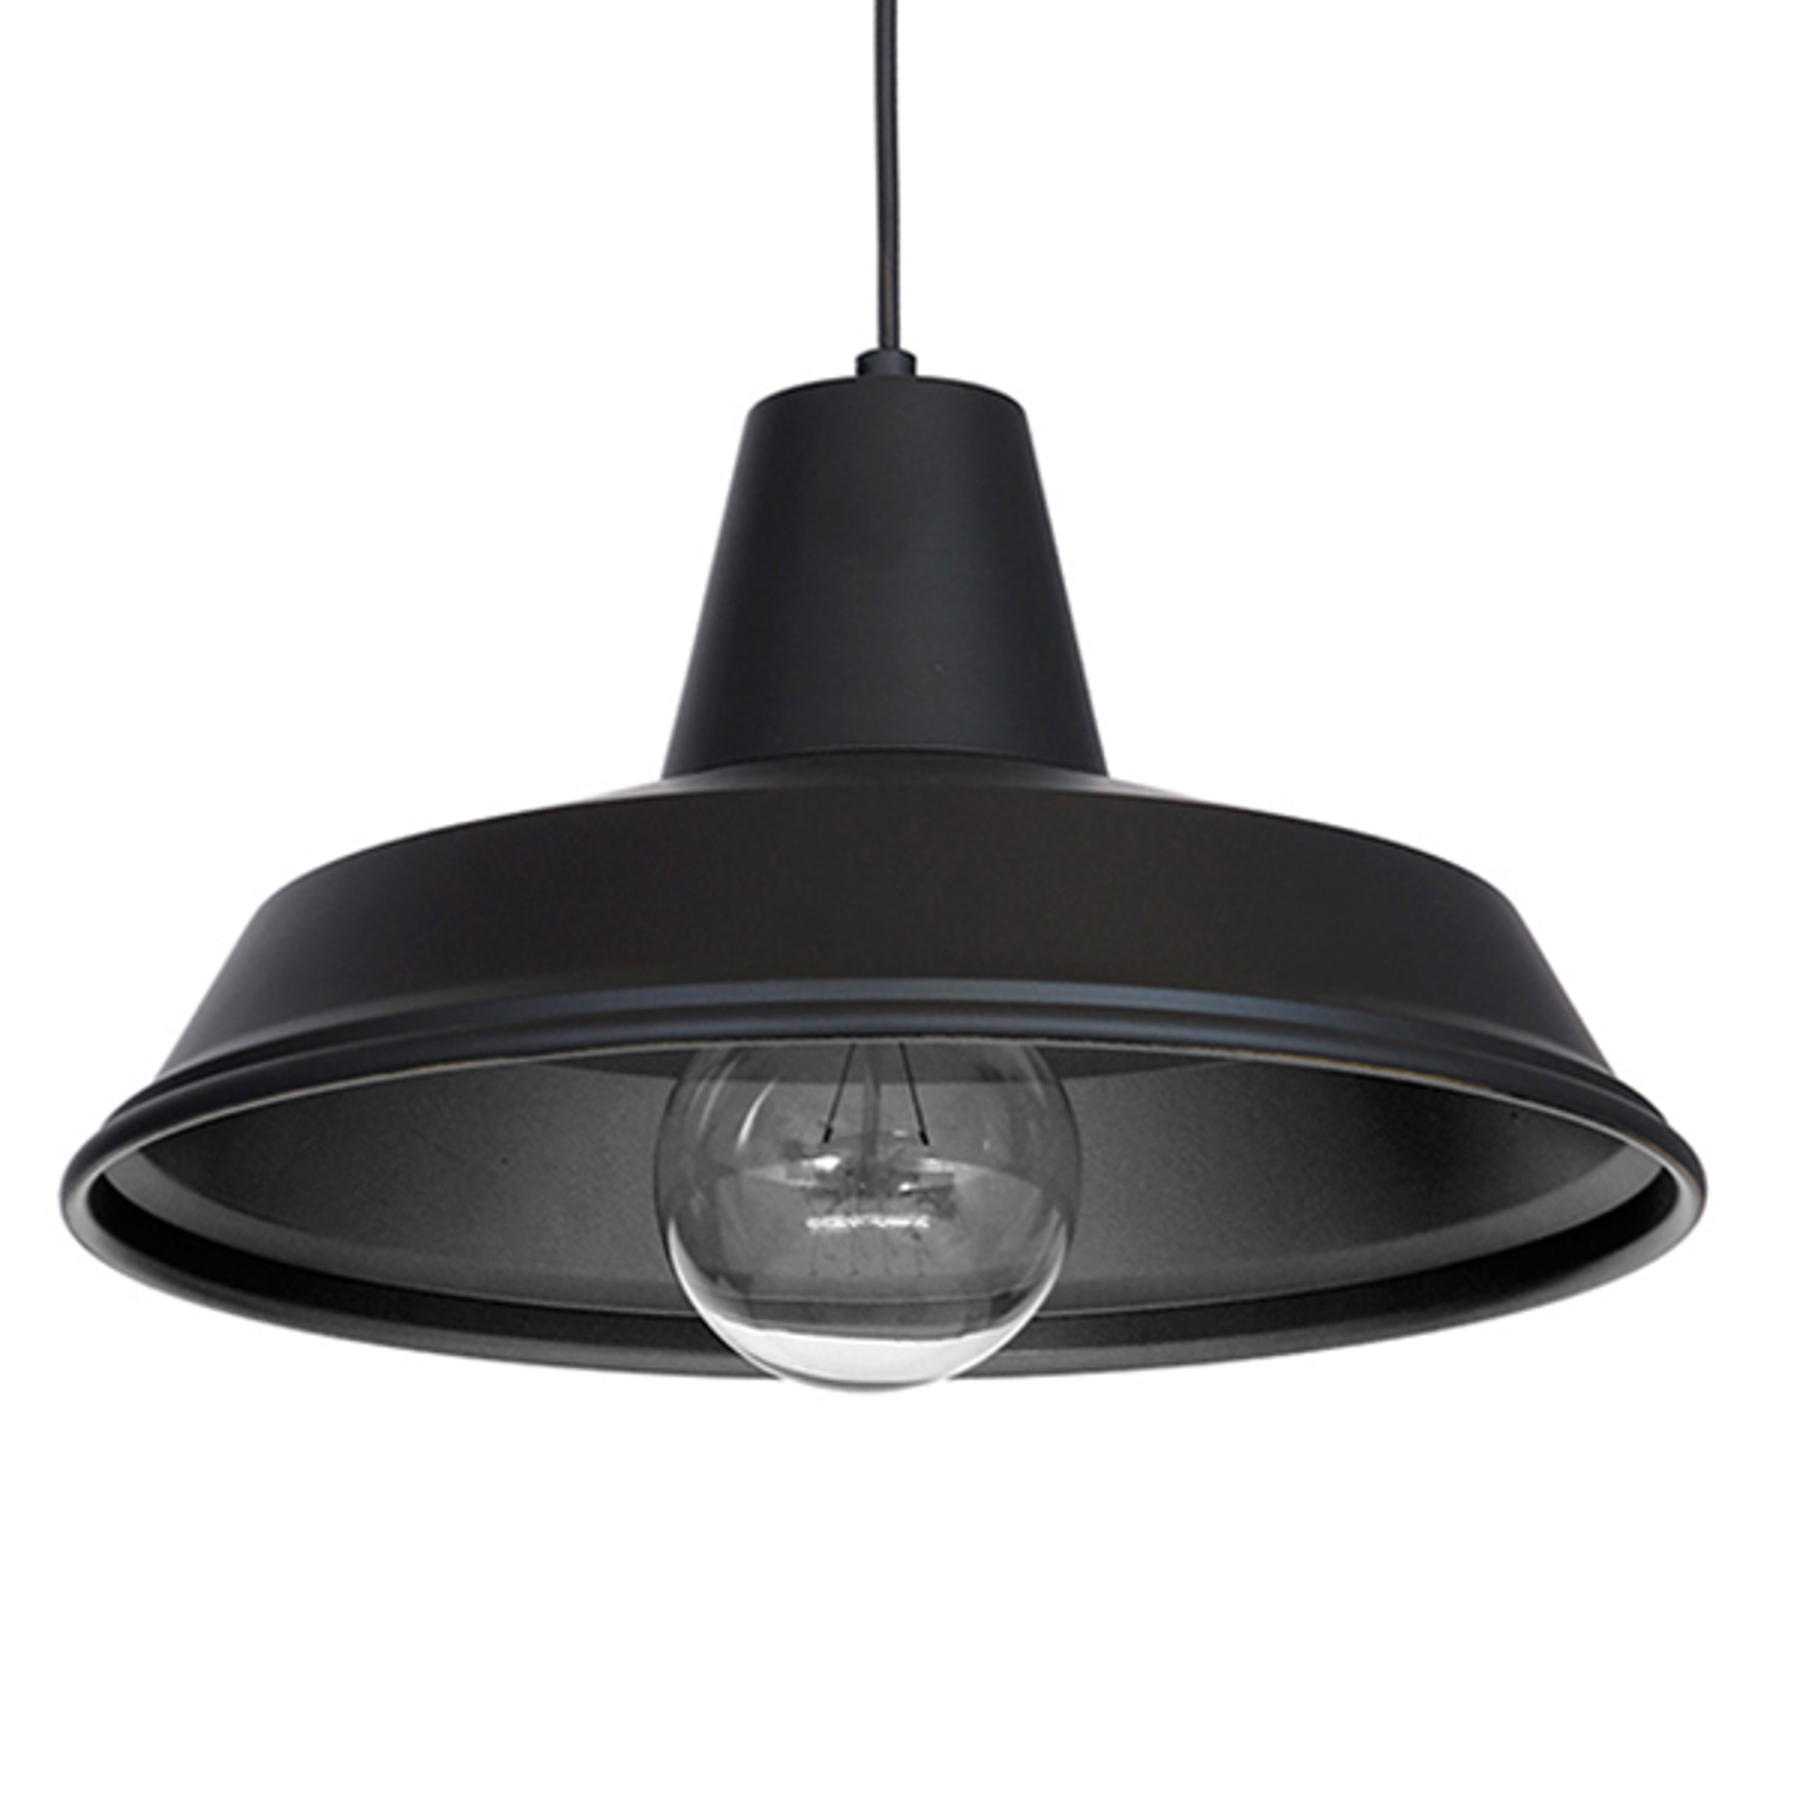 Lampa wisząca Class, czarna/czarna